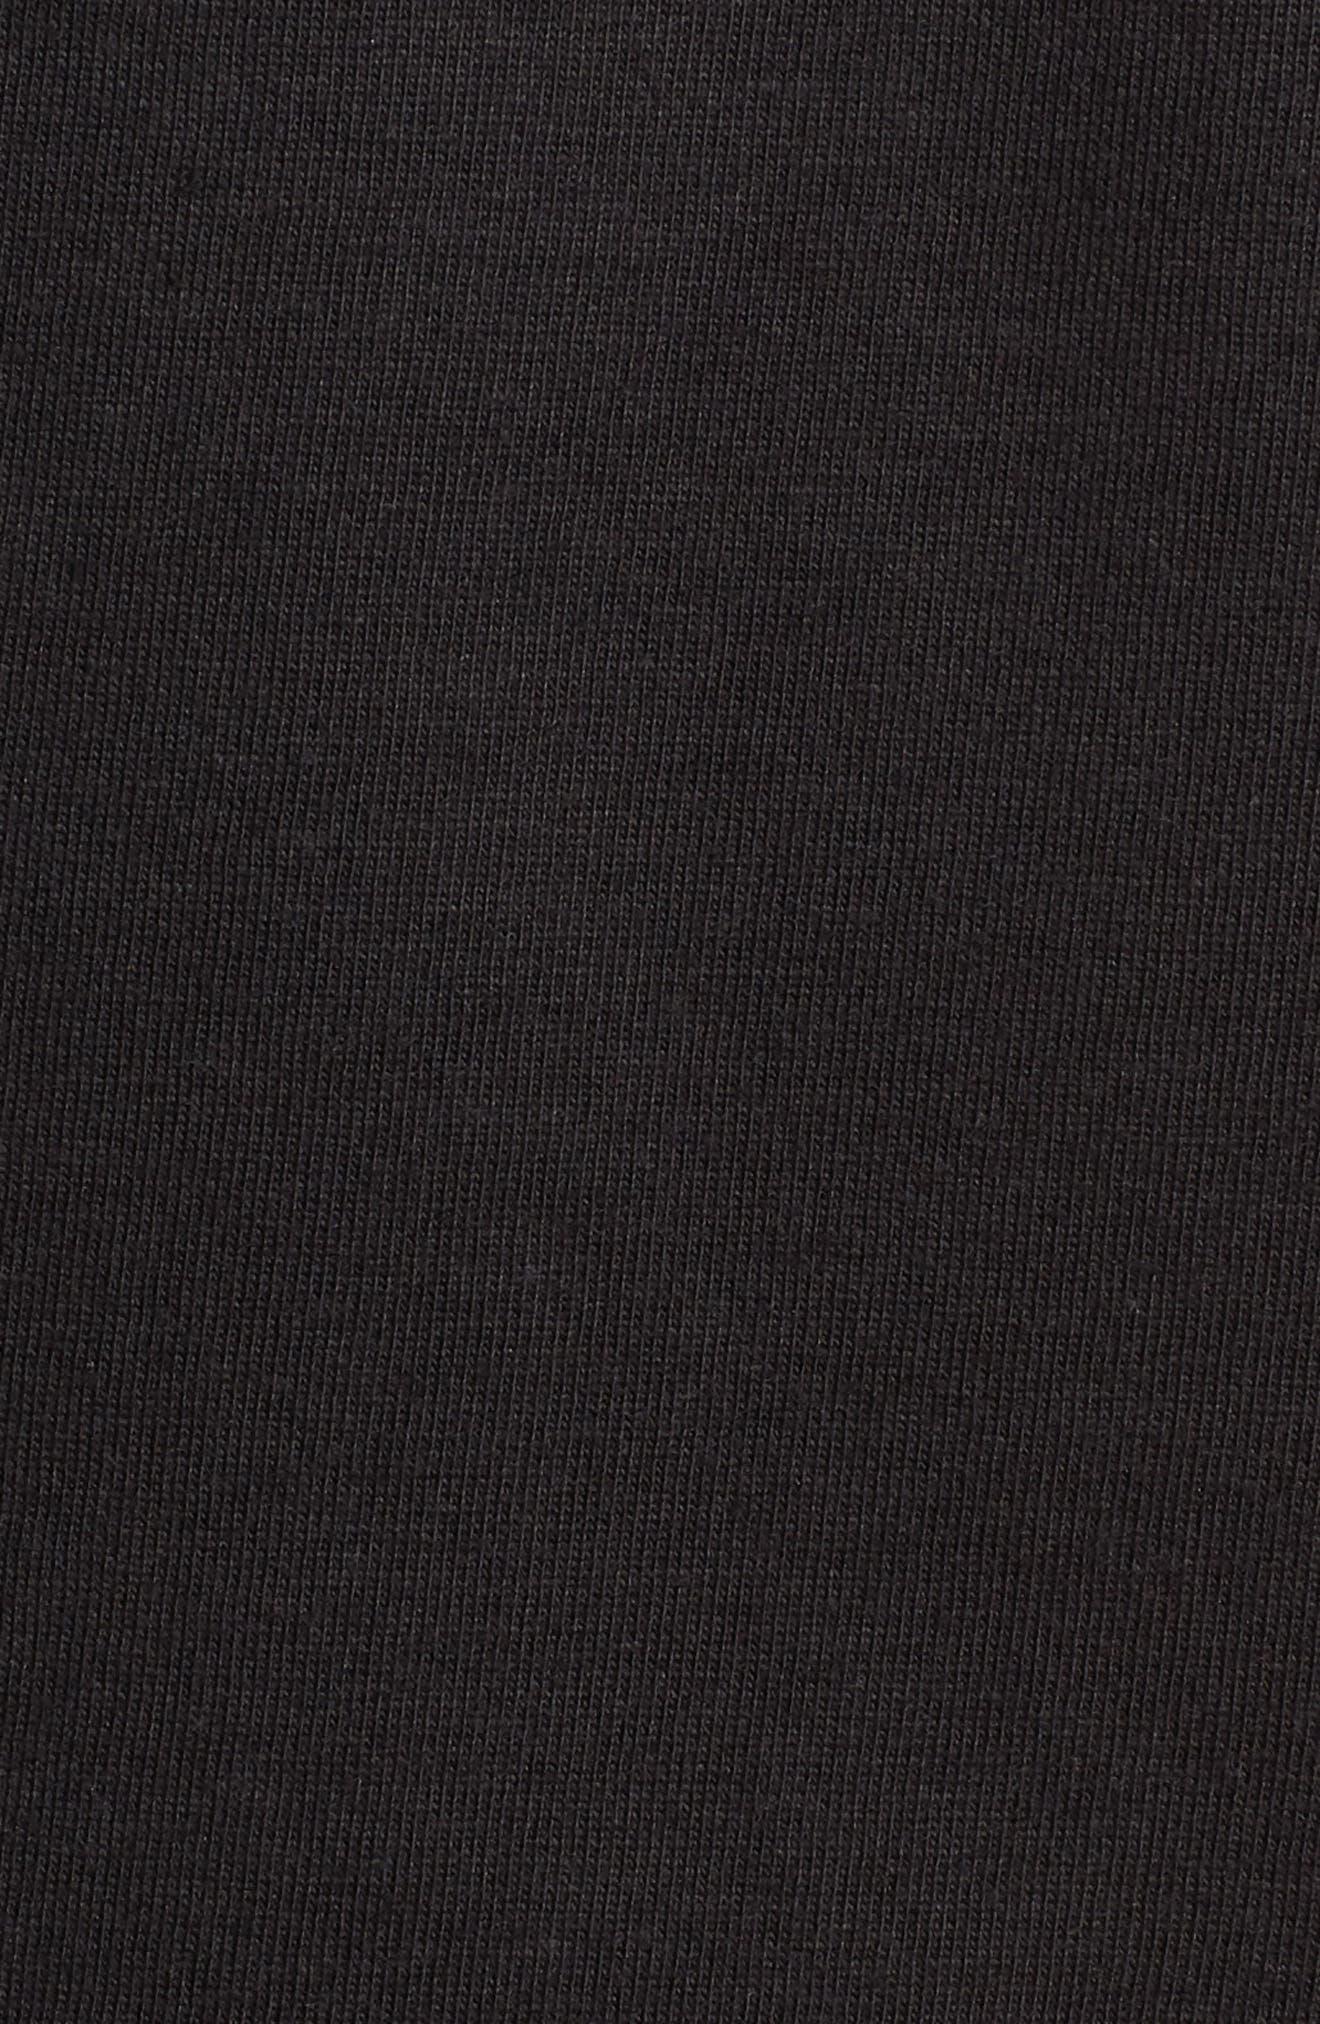 Be Fronds T-Shirt,                             Alternate thumbnail 5, color,                             010